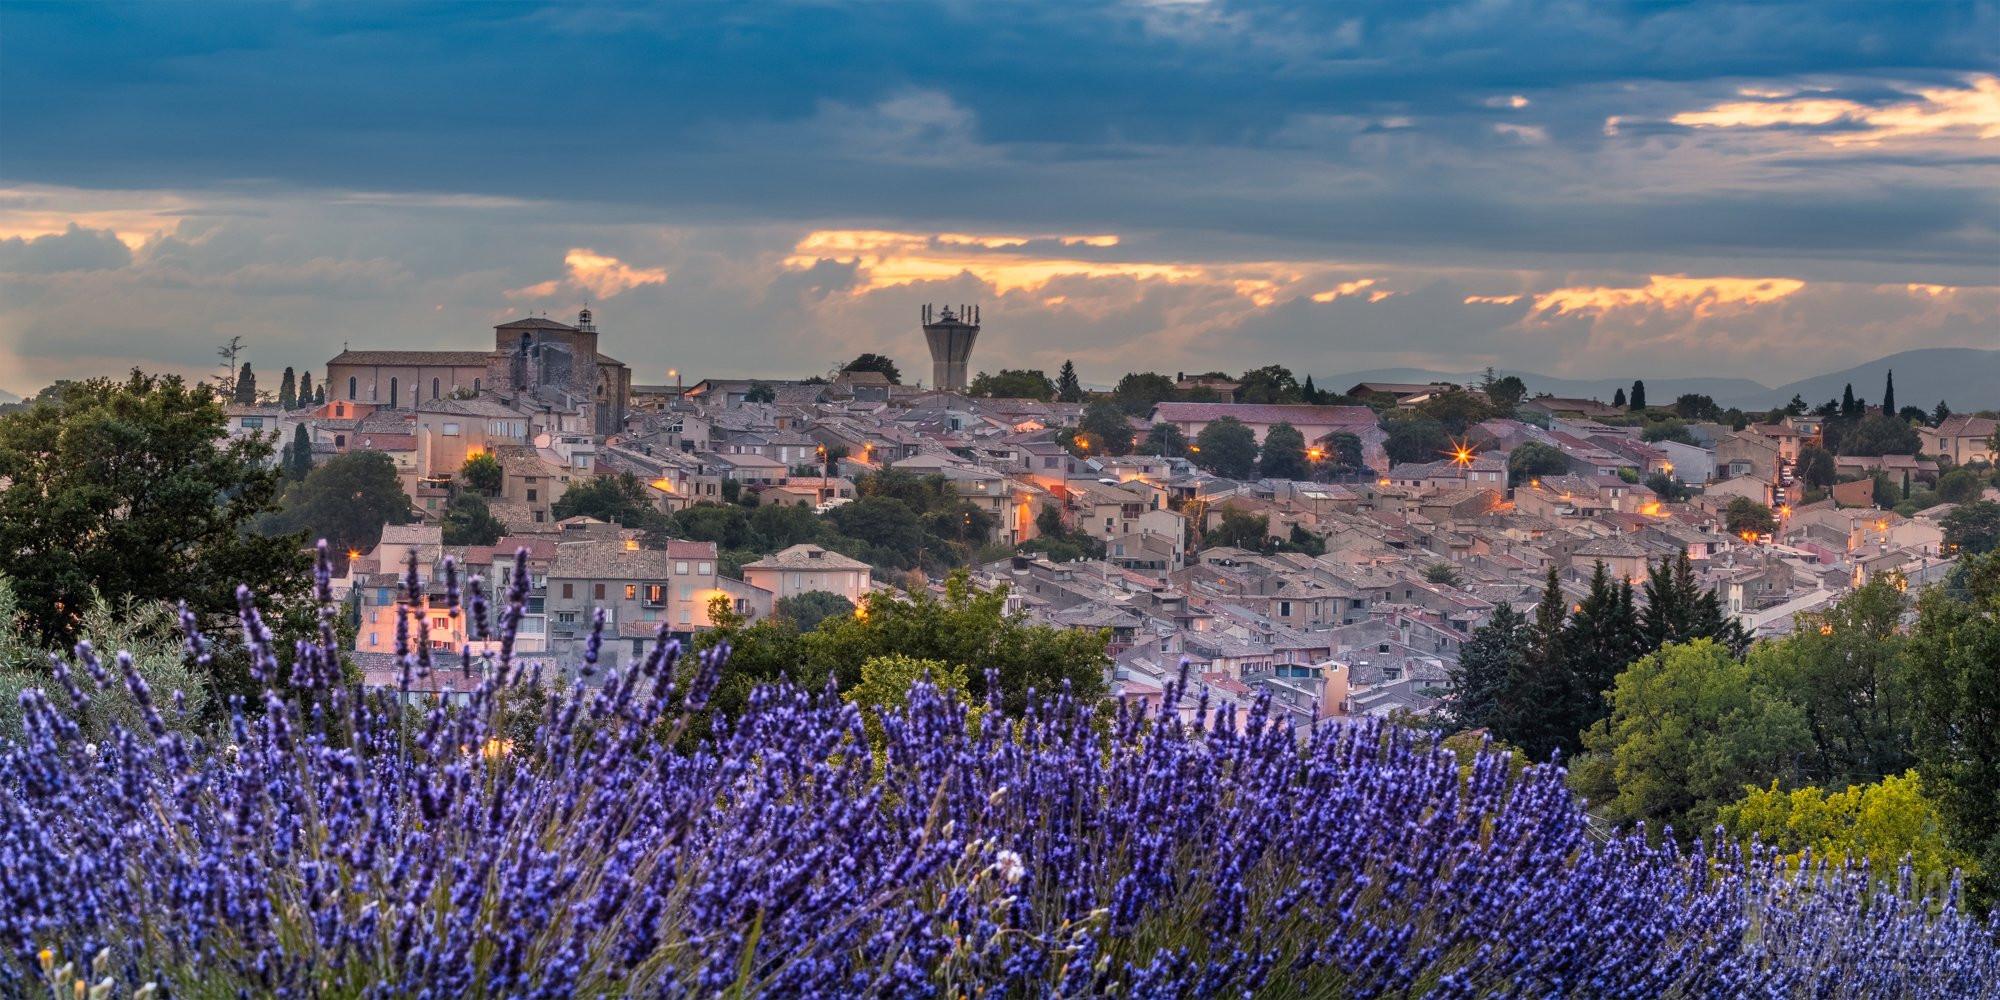 Valensole village colorful sunset, Haute-Provence France